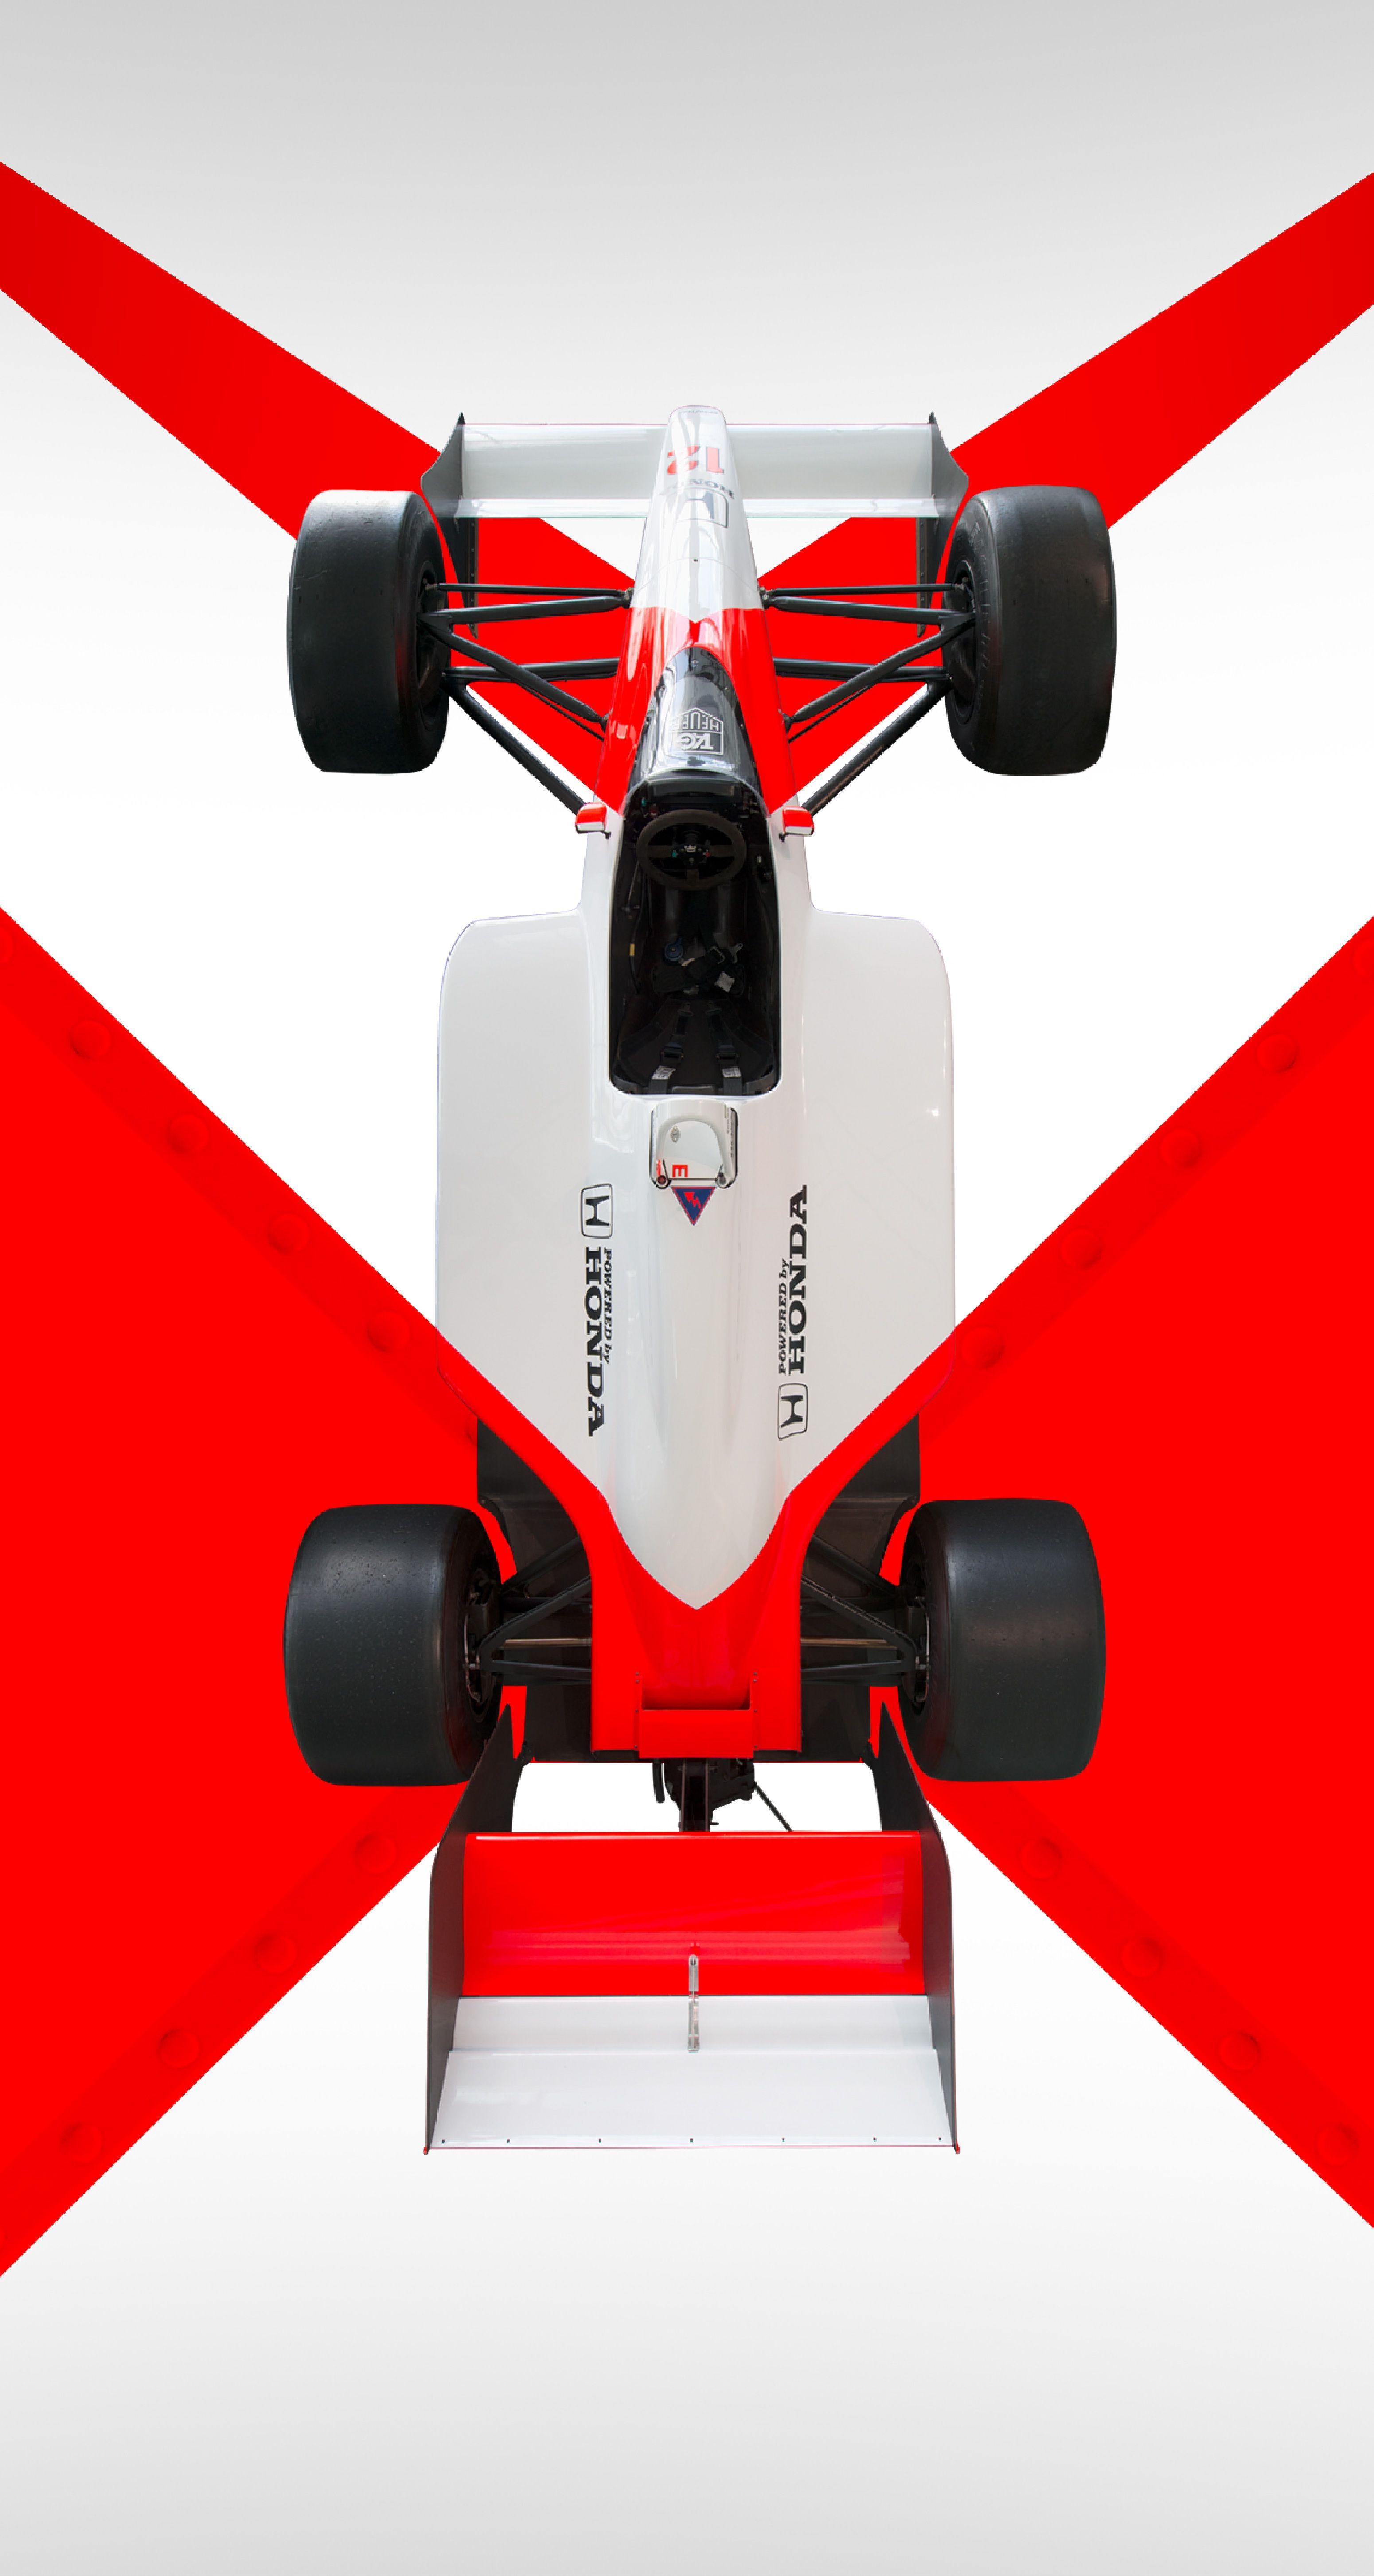 Mp4 4 Rocket Red White Ayrton Senna Automobilismo Ayrton